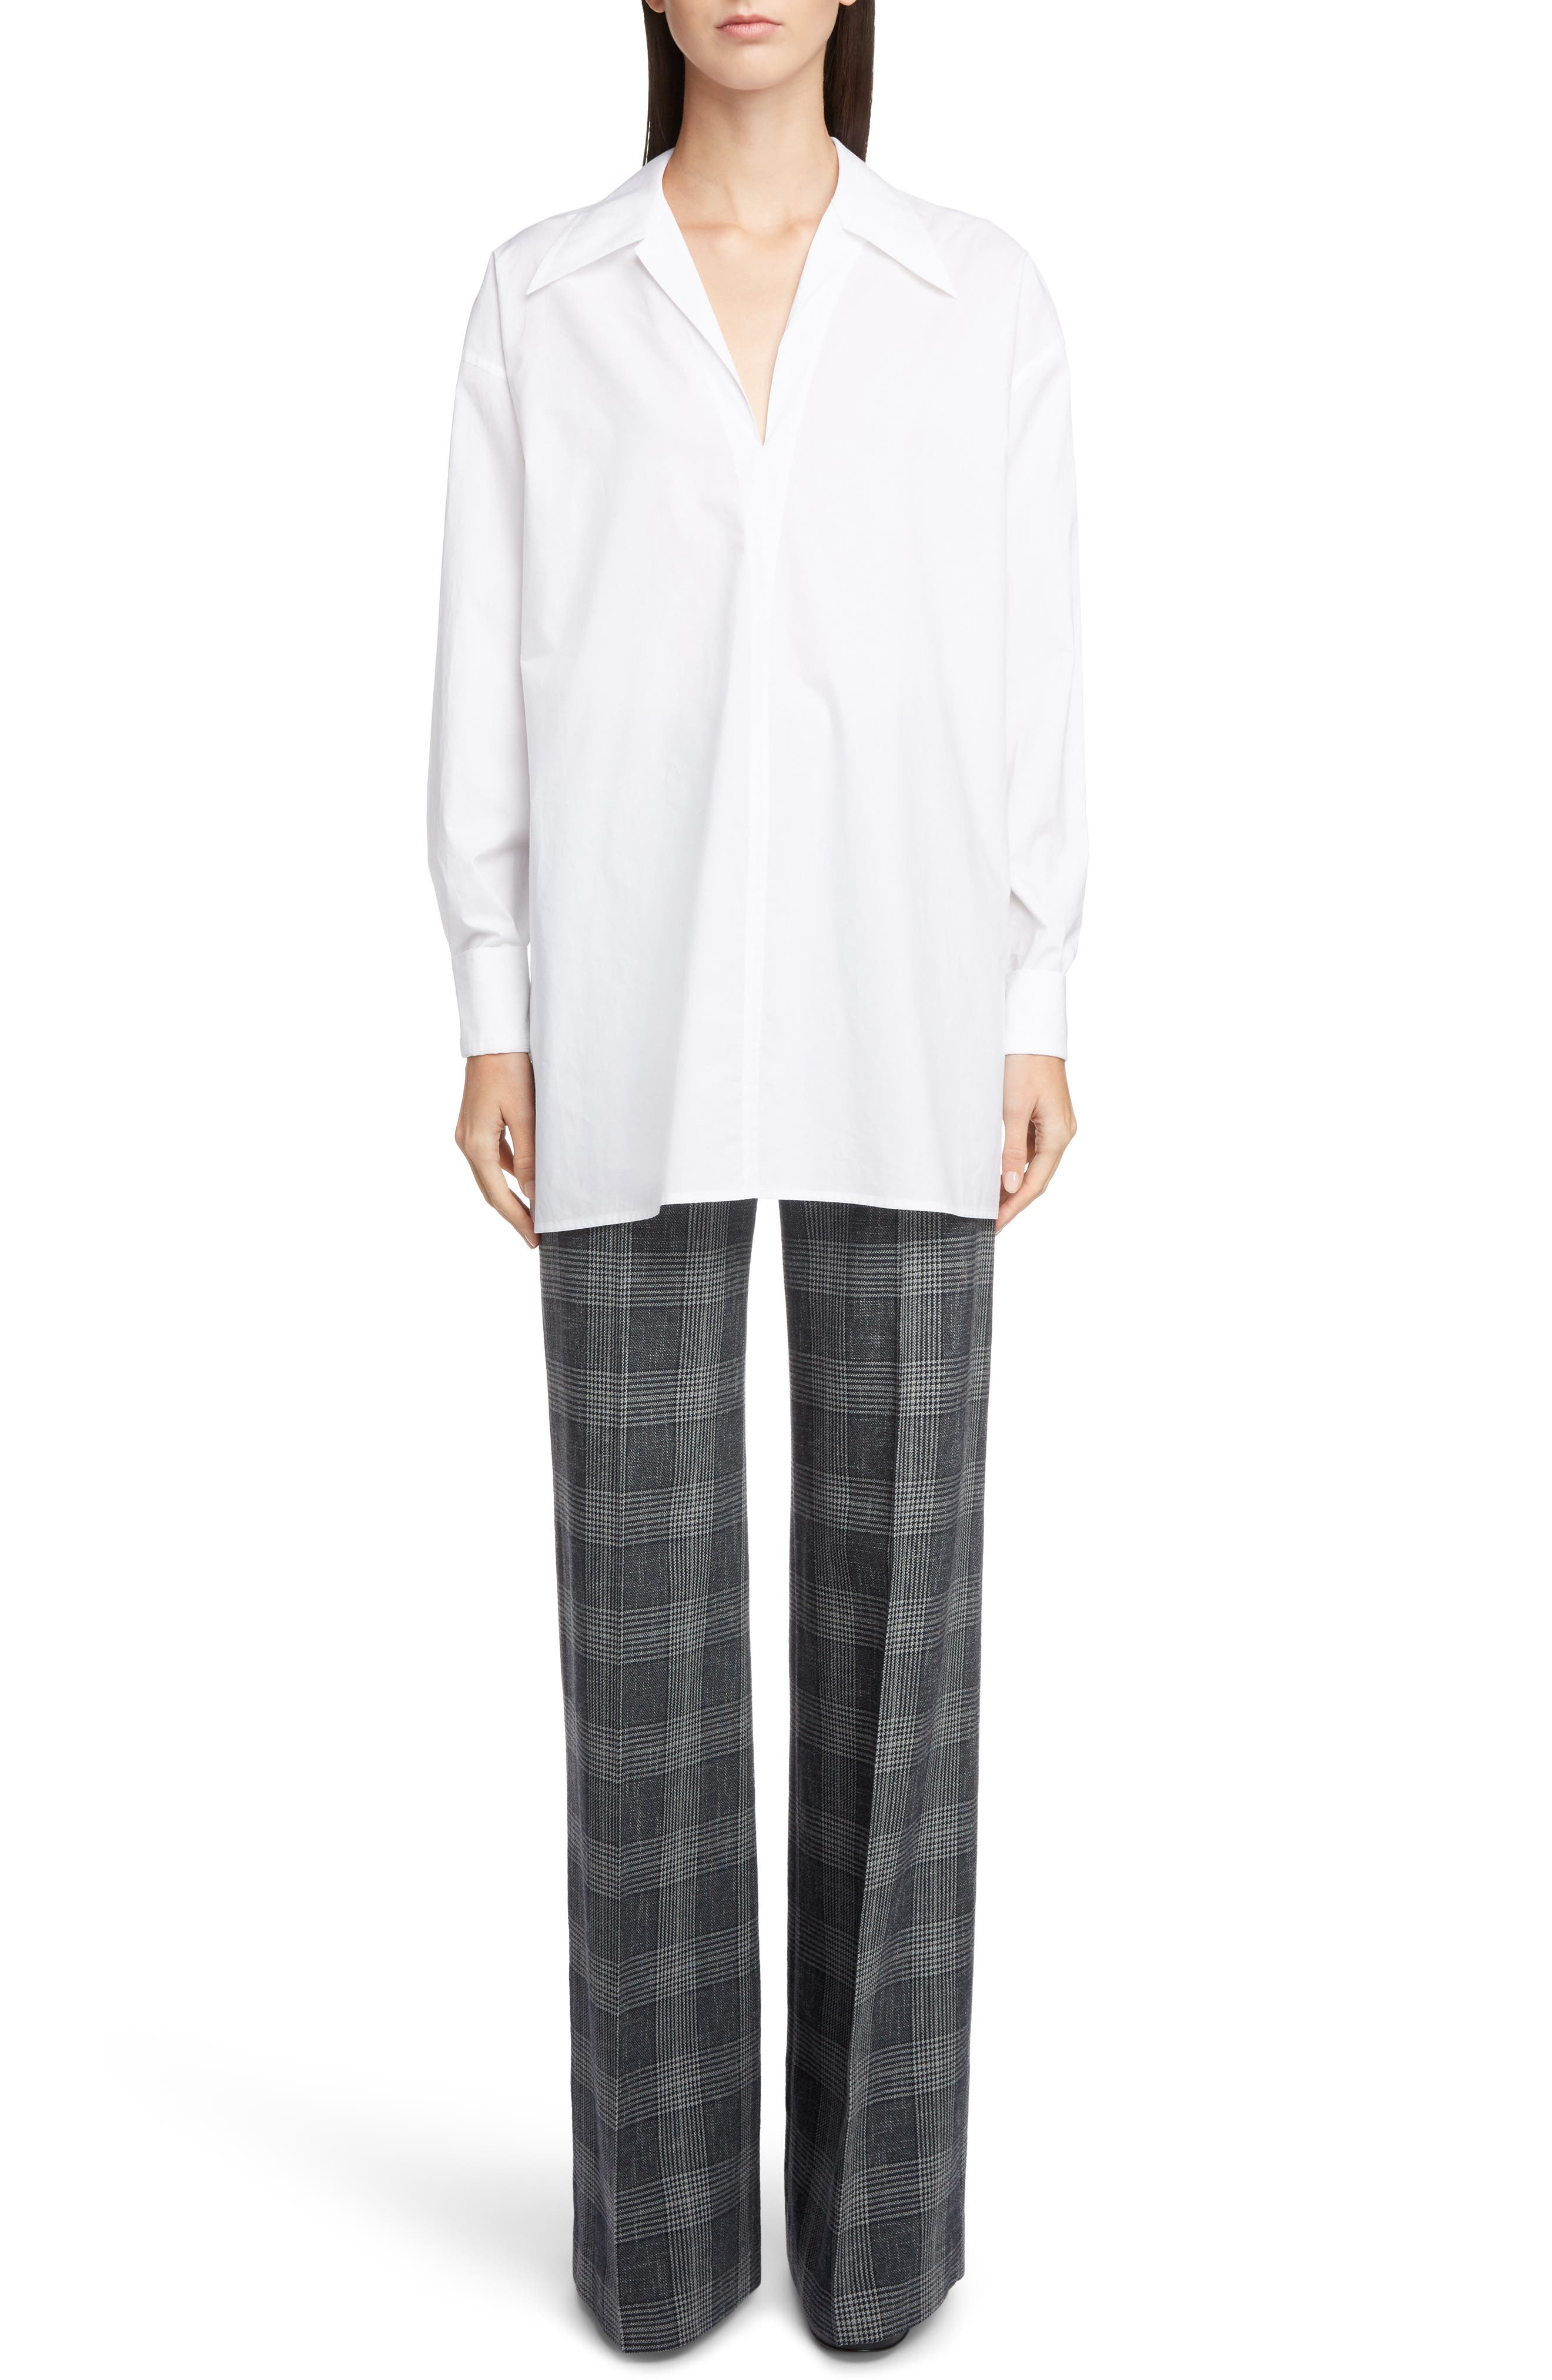 ACNE STUDIOS,                             Spread Collar Shirt,                             Alternate thumbnail 7, color,                             WHITE